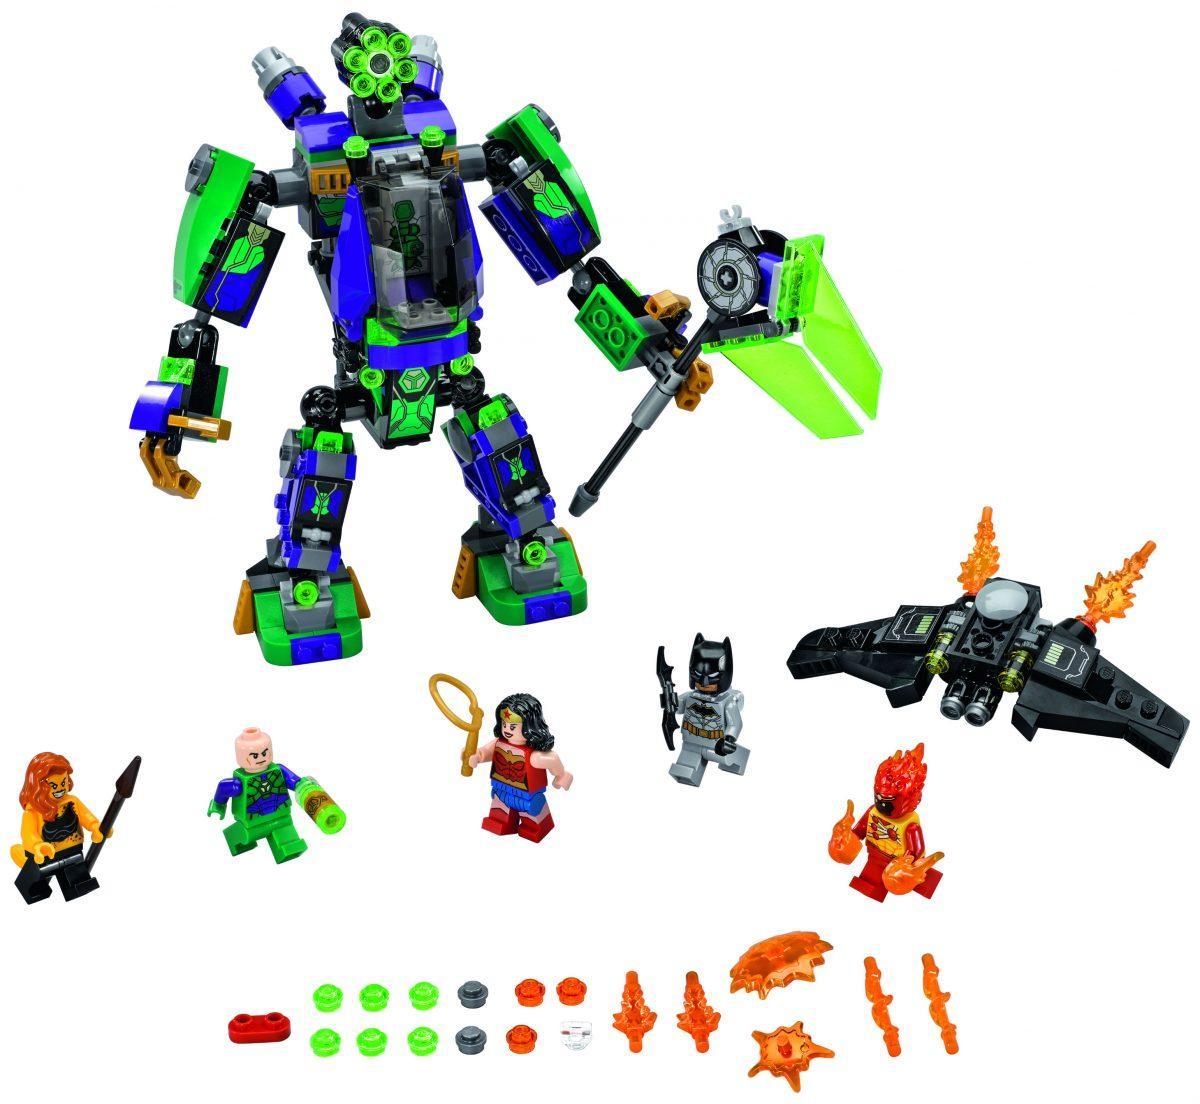 76097_Lex-Luthor-Mech-Takedown-1200x1104